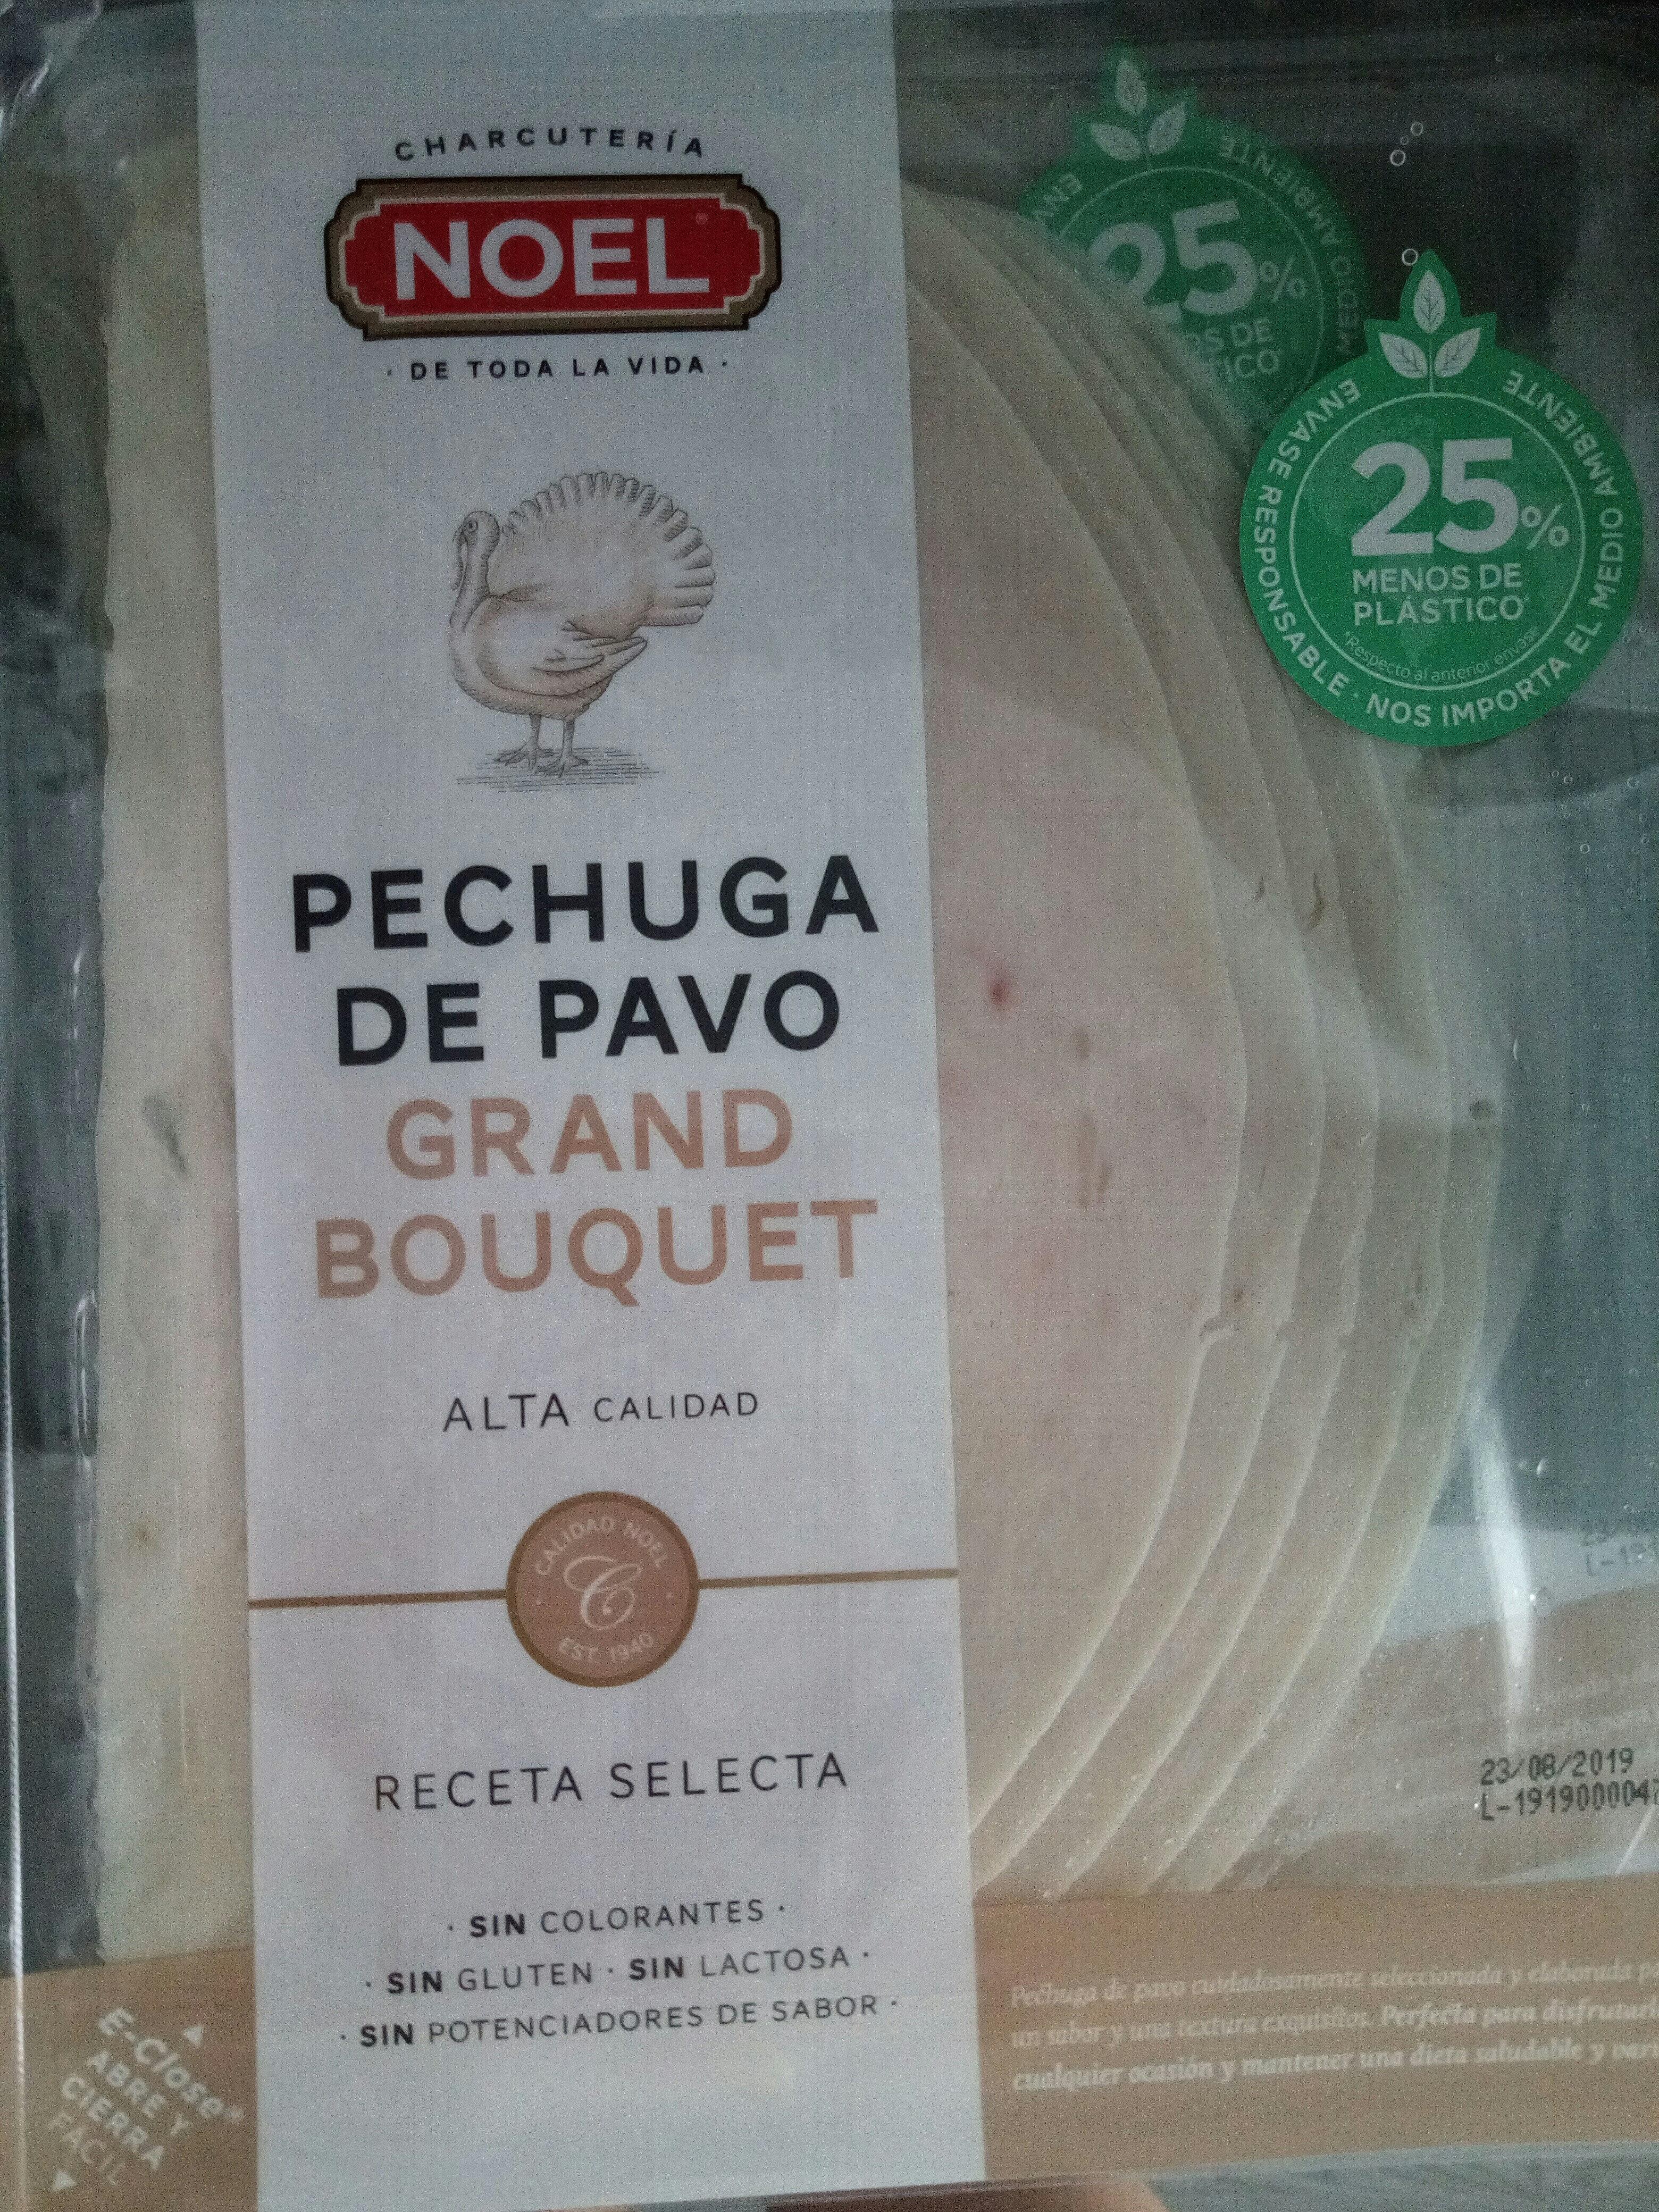 Pechuga de pavo grand bouquet - Producto - es